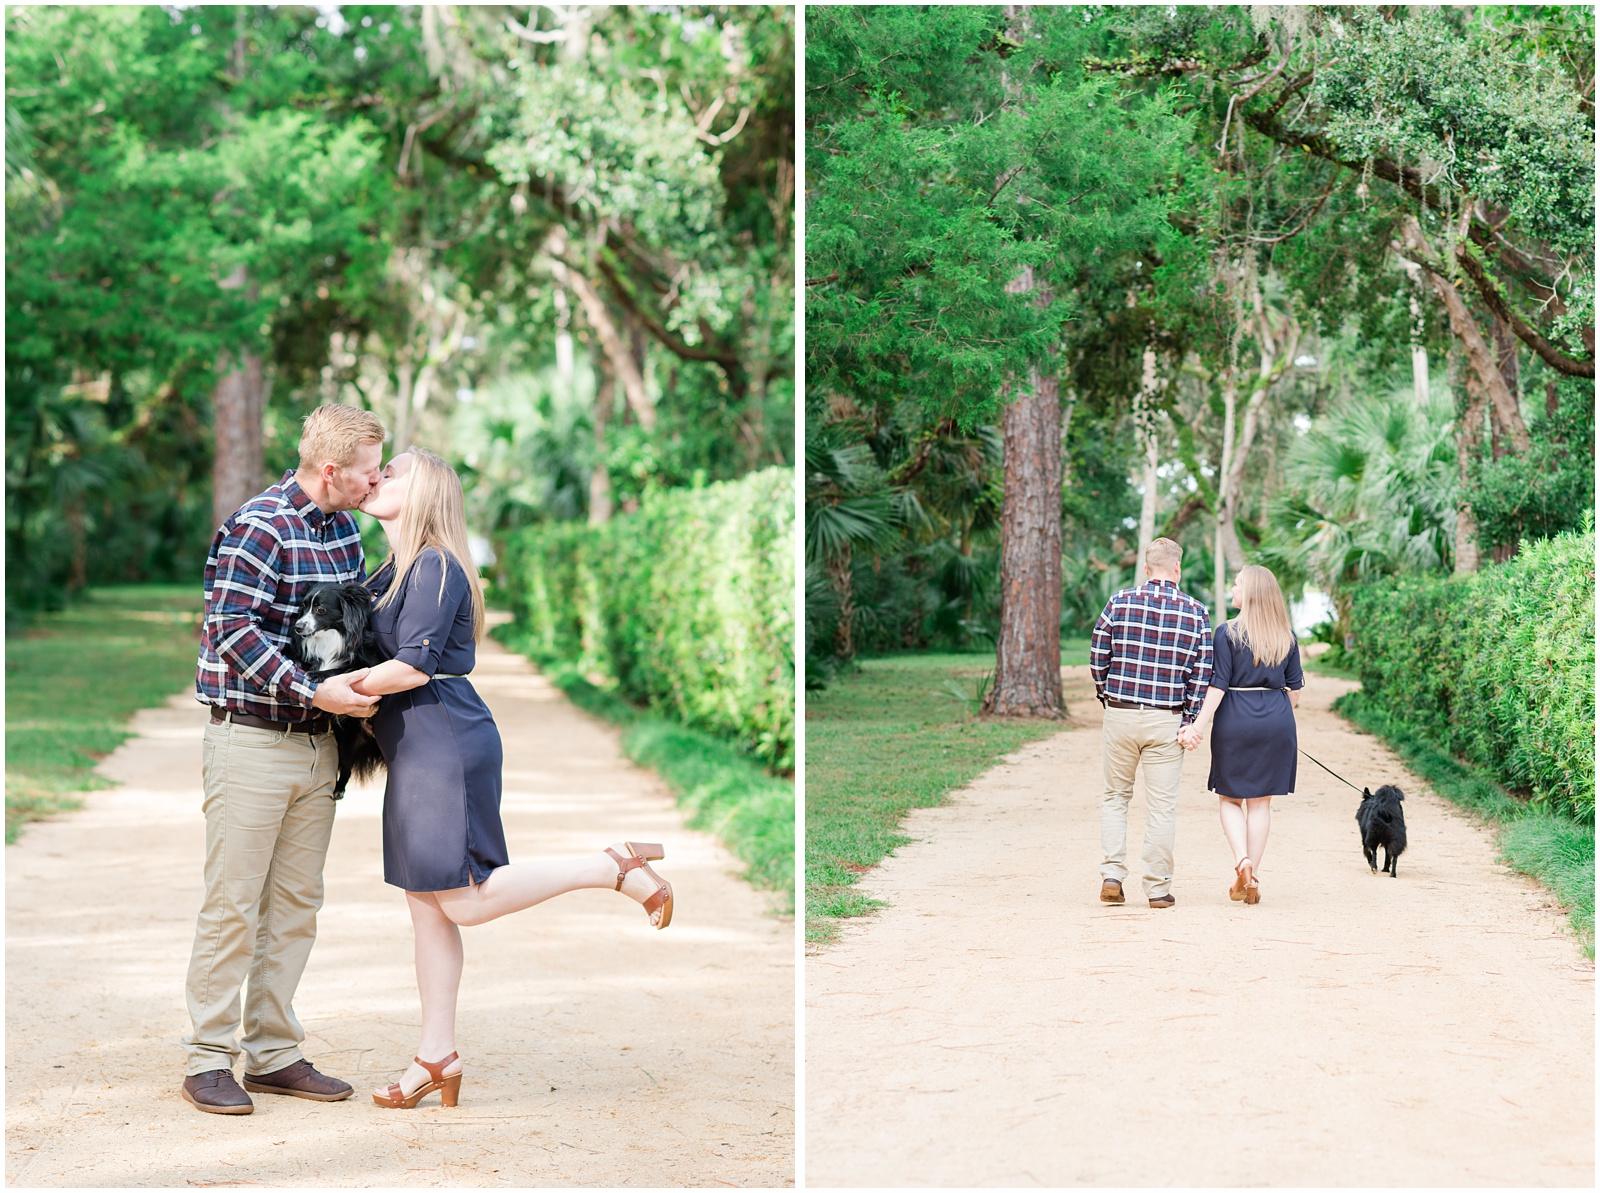 Palm Coast_Washington Oaks Garden_State Park_Engagement_Portraits_4.jpg